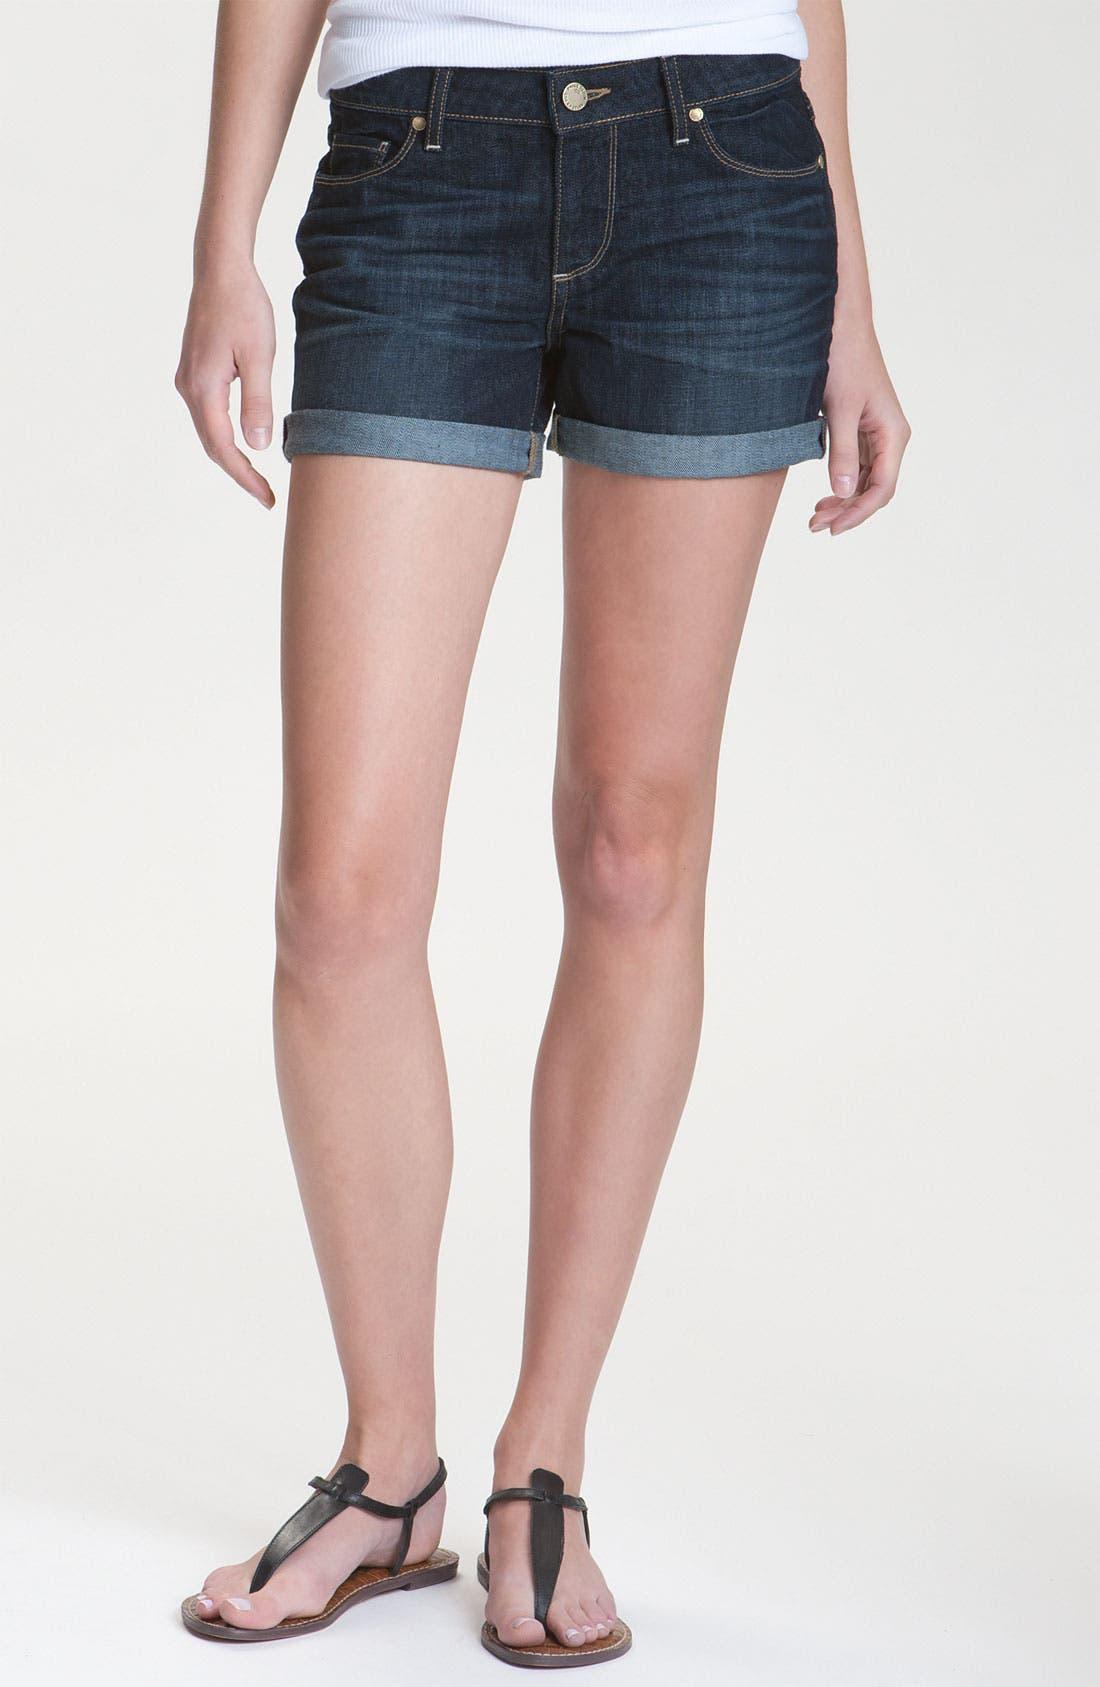 Alternate Image 1 Selected - Paige Denim 'Jimmy Jimmy' Boyfriend Shorts